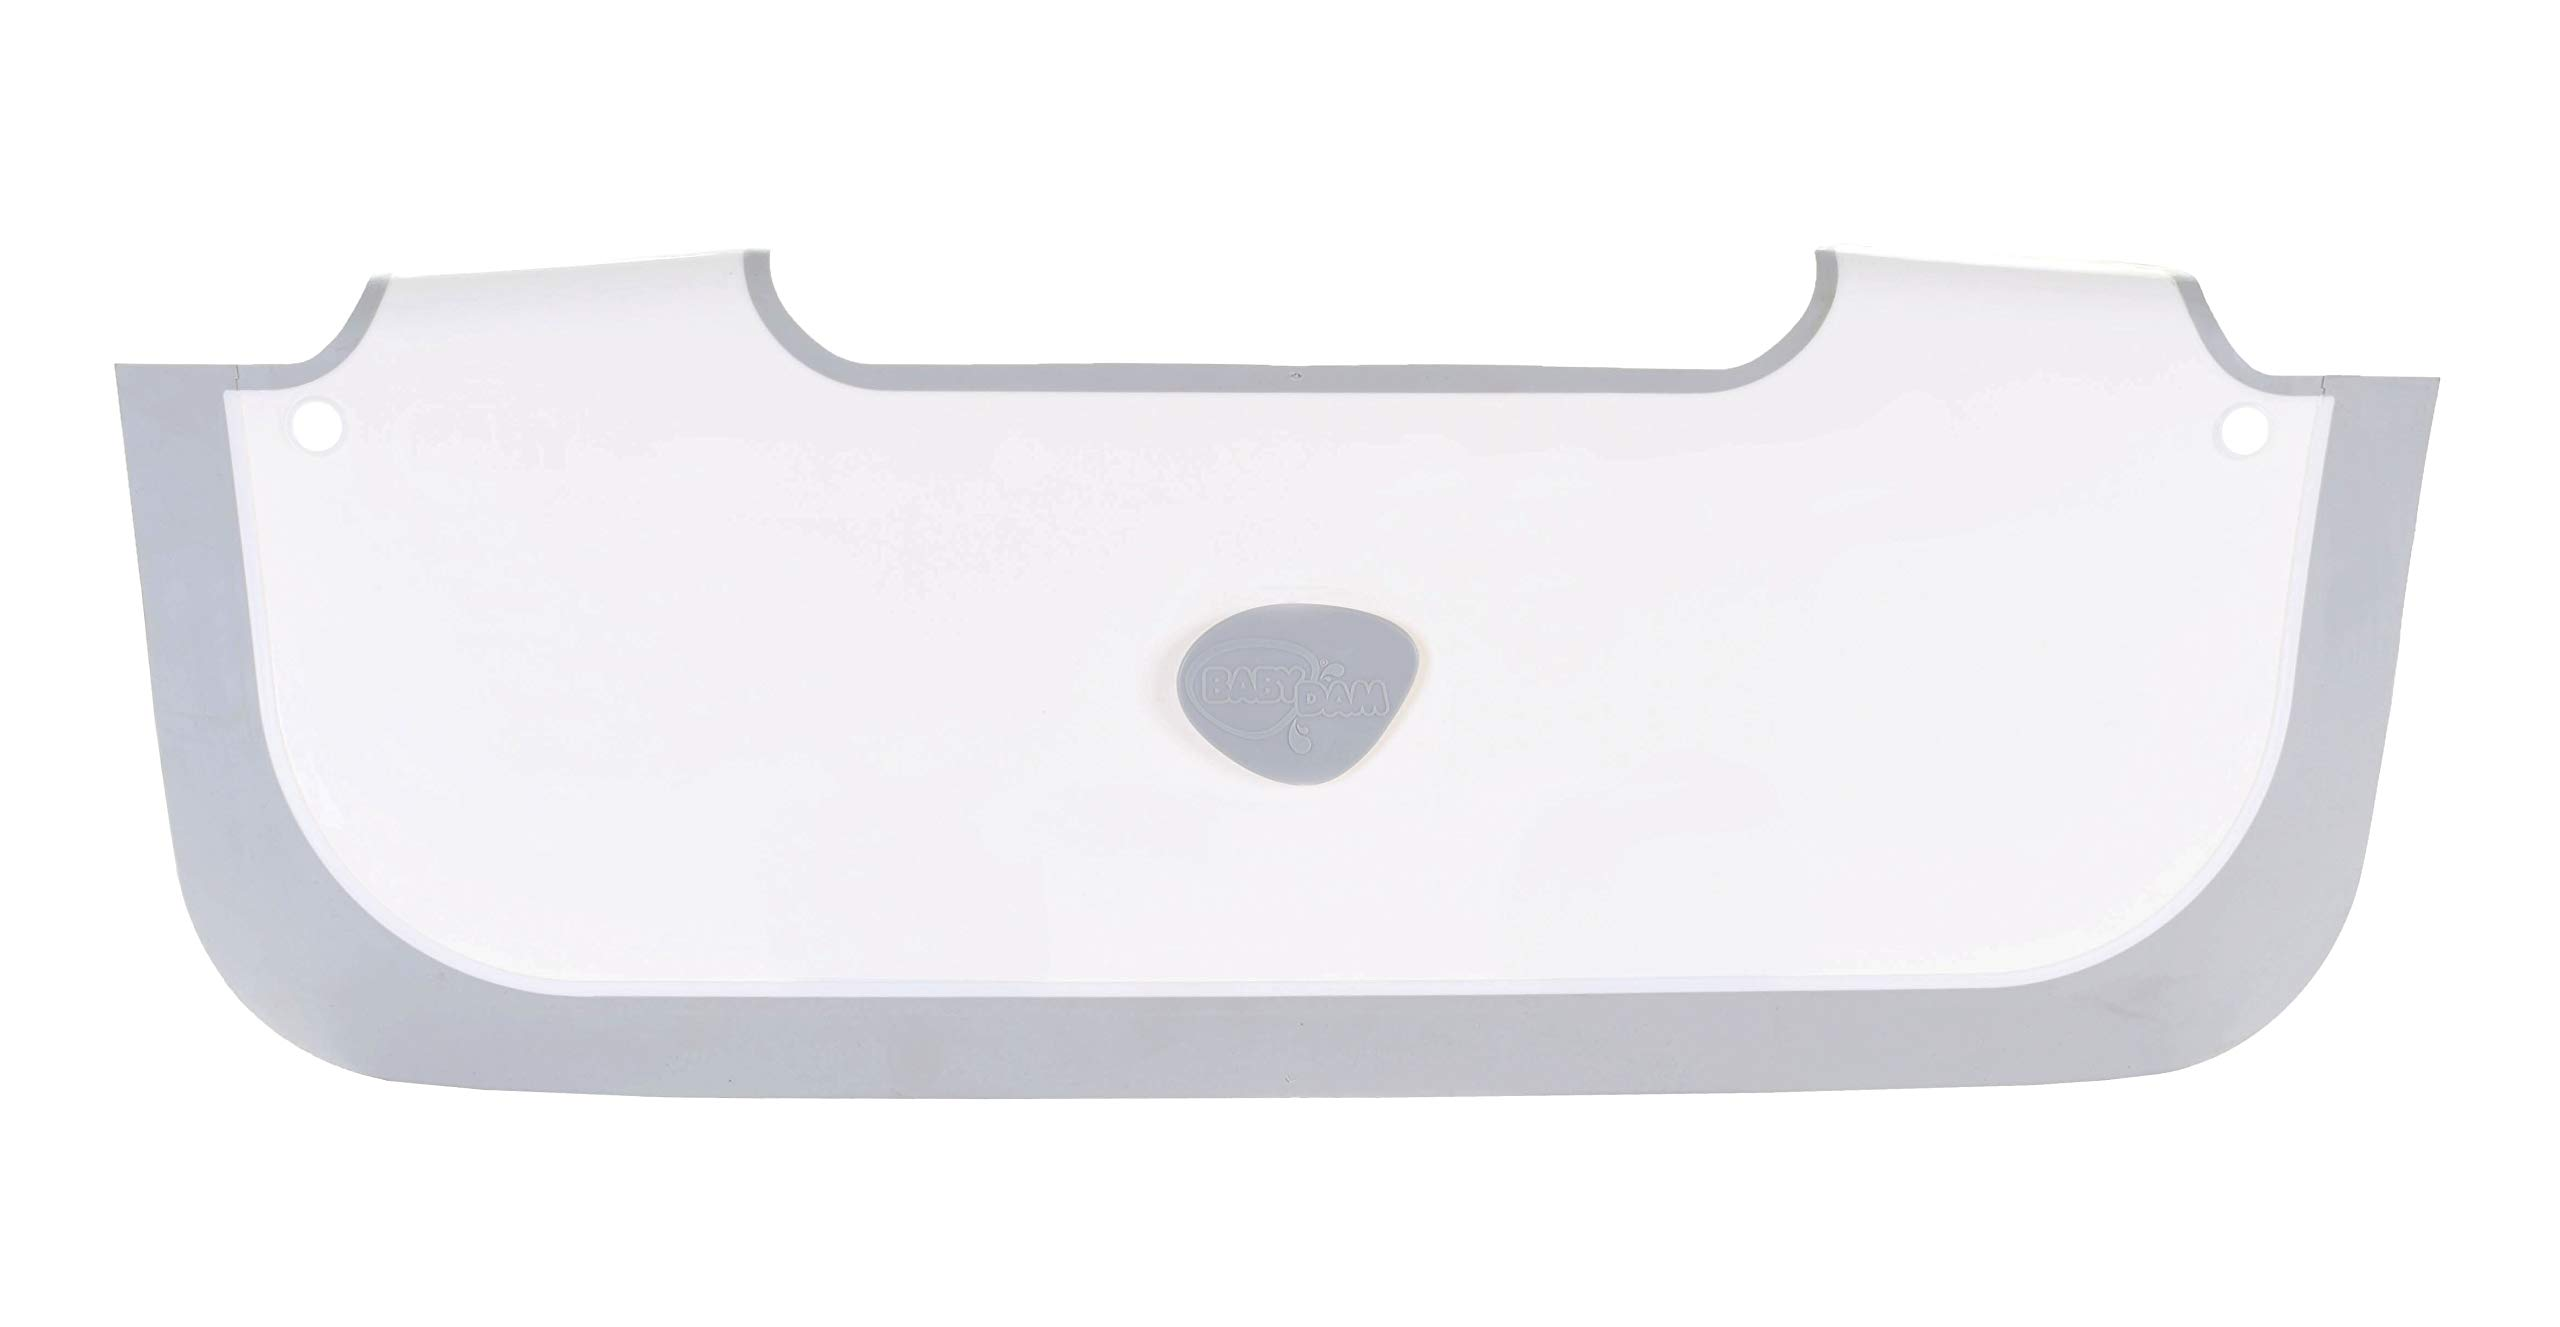 BabyDam Bathwater Barrier, Converts a Standard Non-Textured Bathtub to a Baby Bathtub